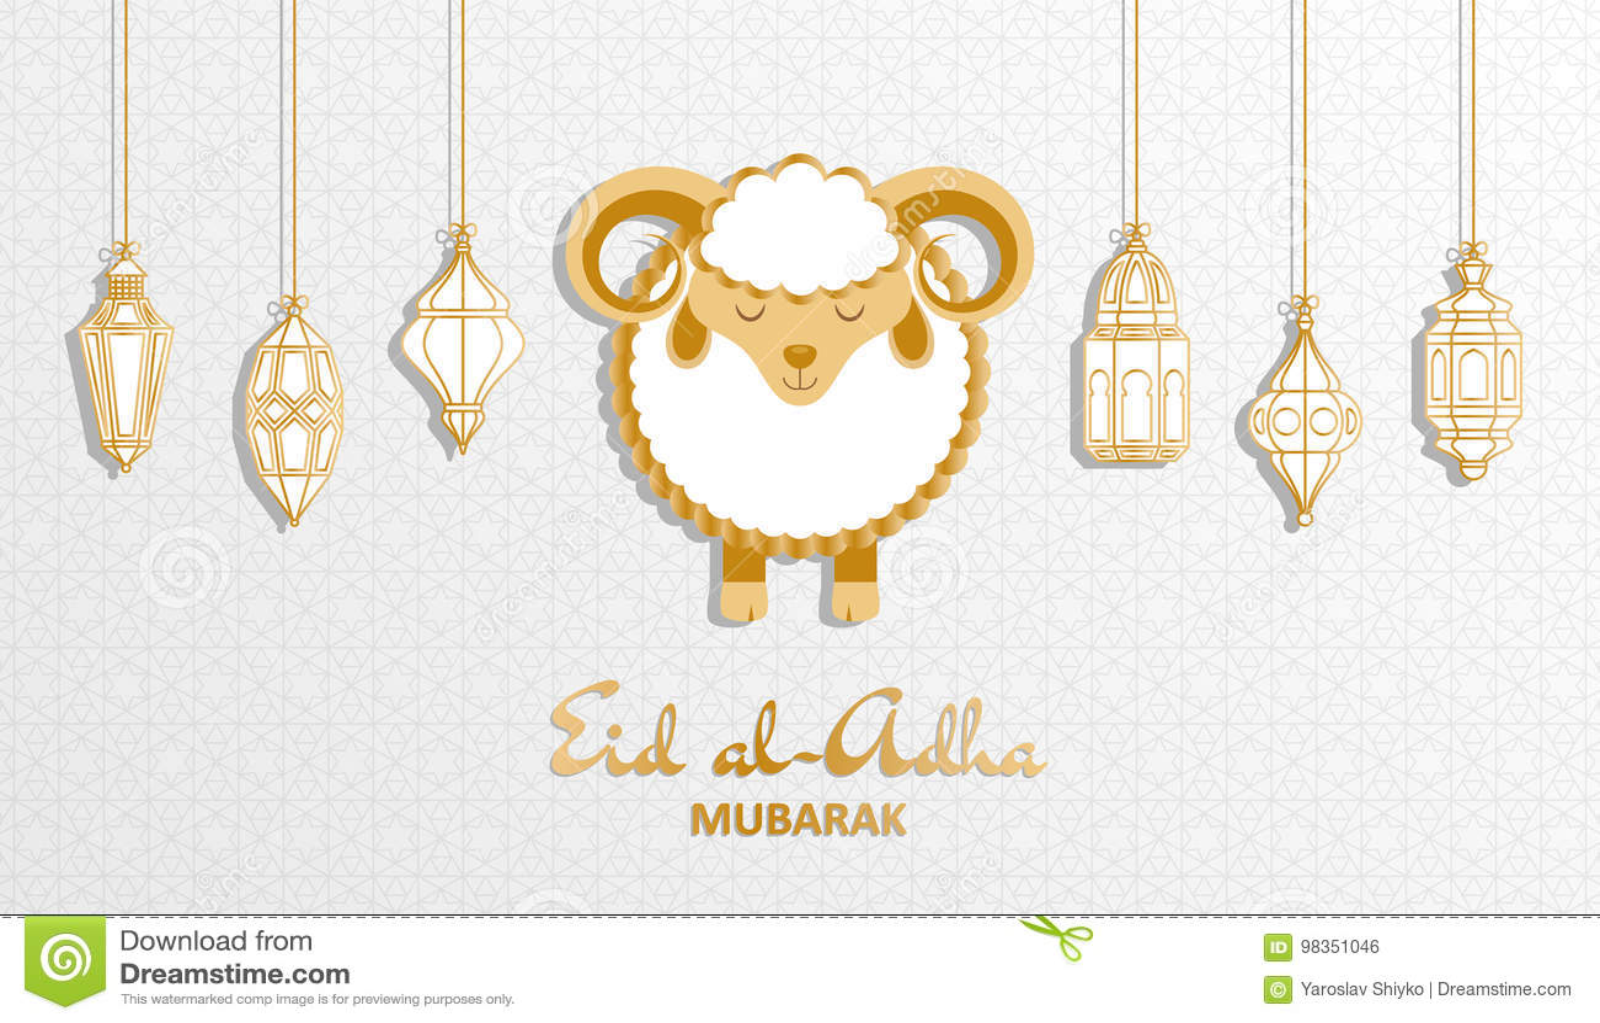 Eid Al Adha Background Islamic Arabic Lantern And Sheep Greeting